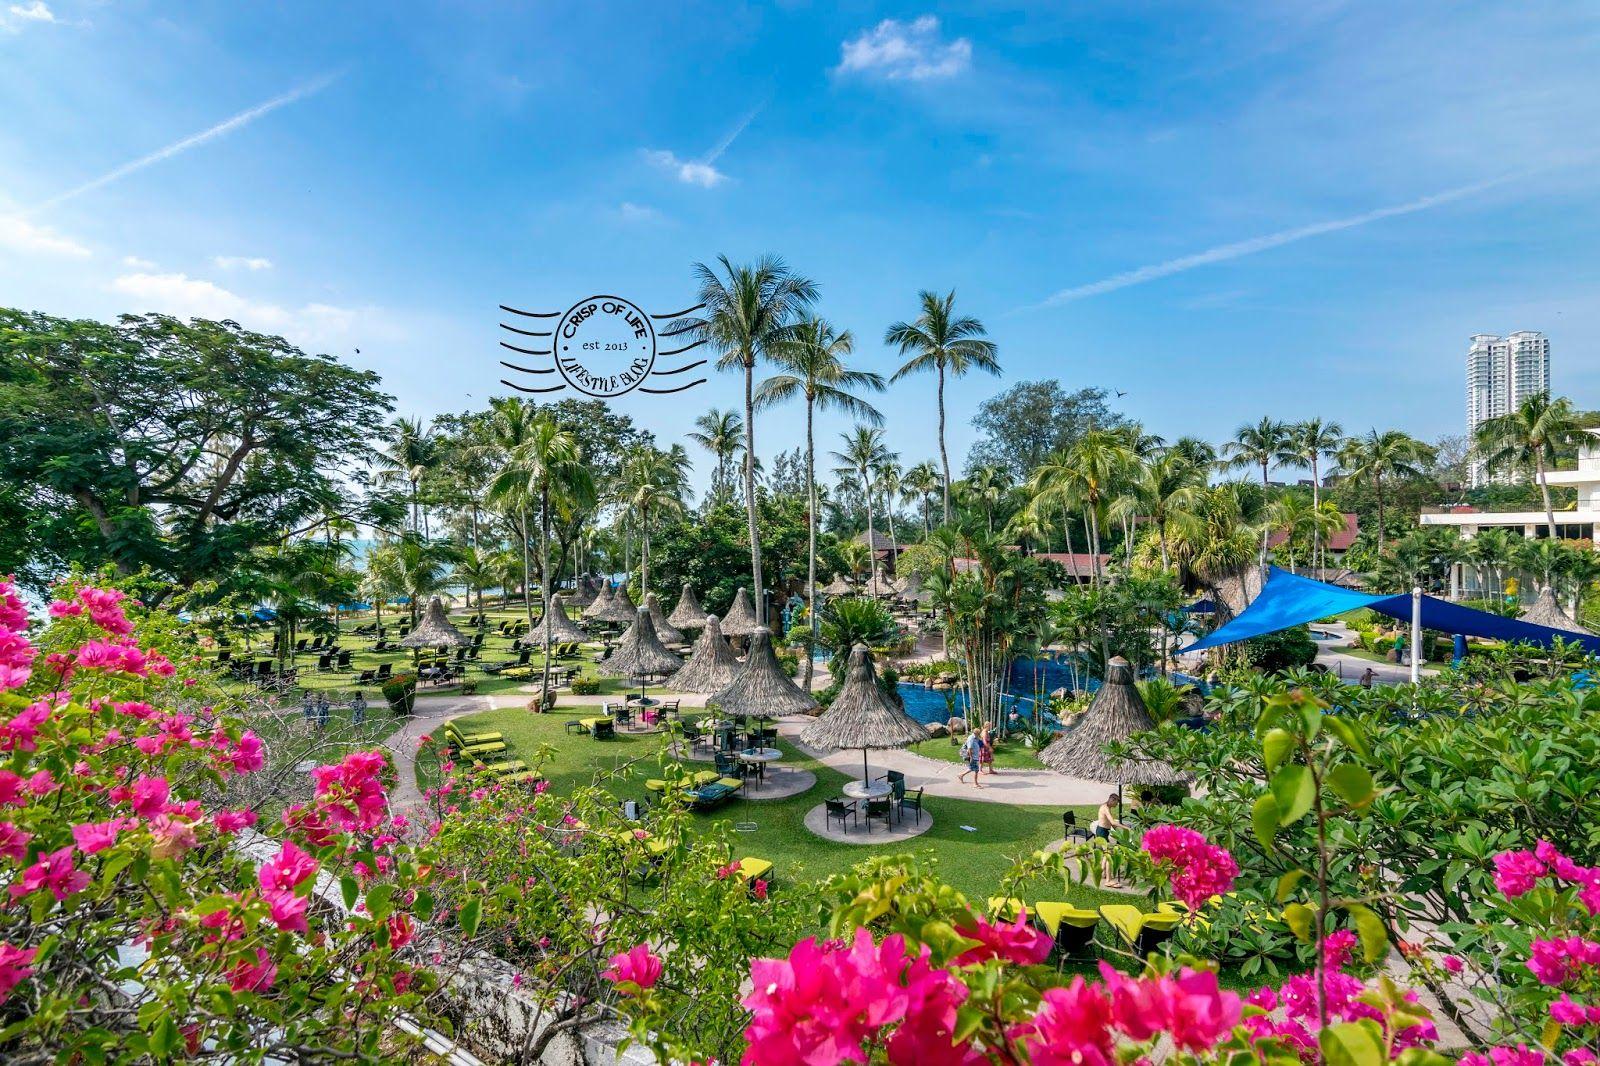 Golden Sands Resort Batu Ferringhi Penang Sands Resort Batu Ferringhi Resort